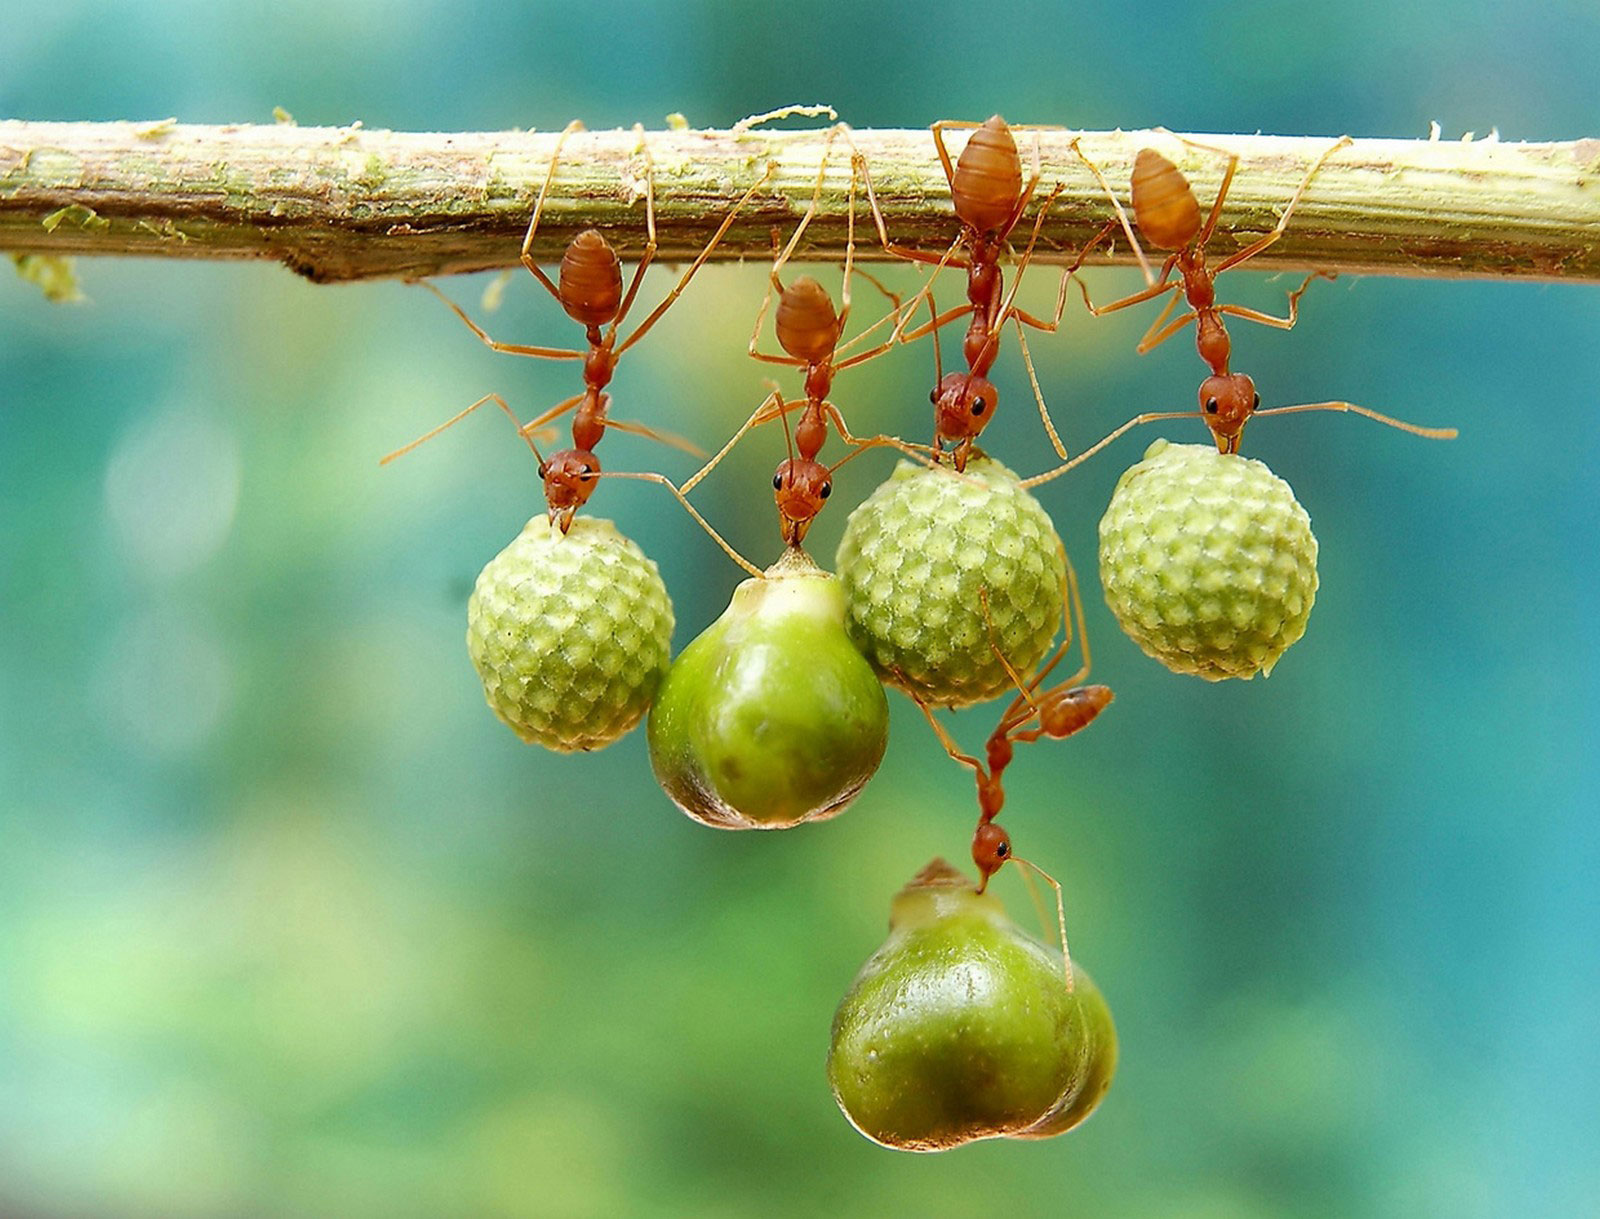 муравьи с семенами